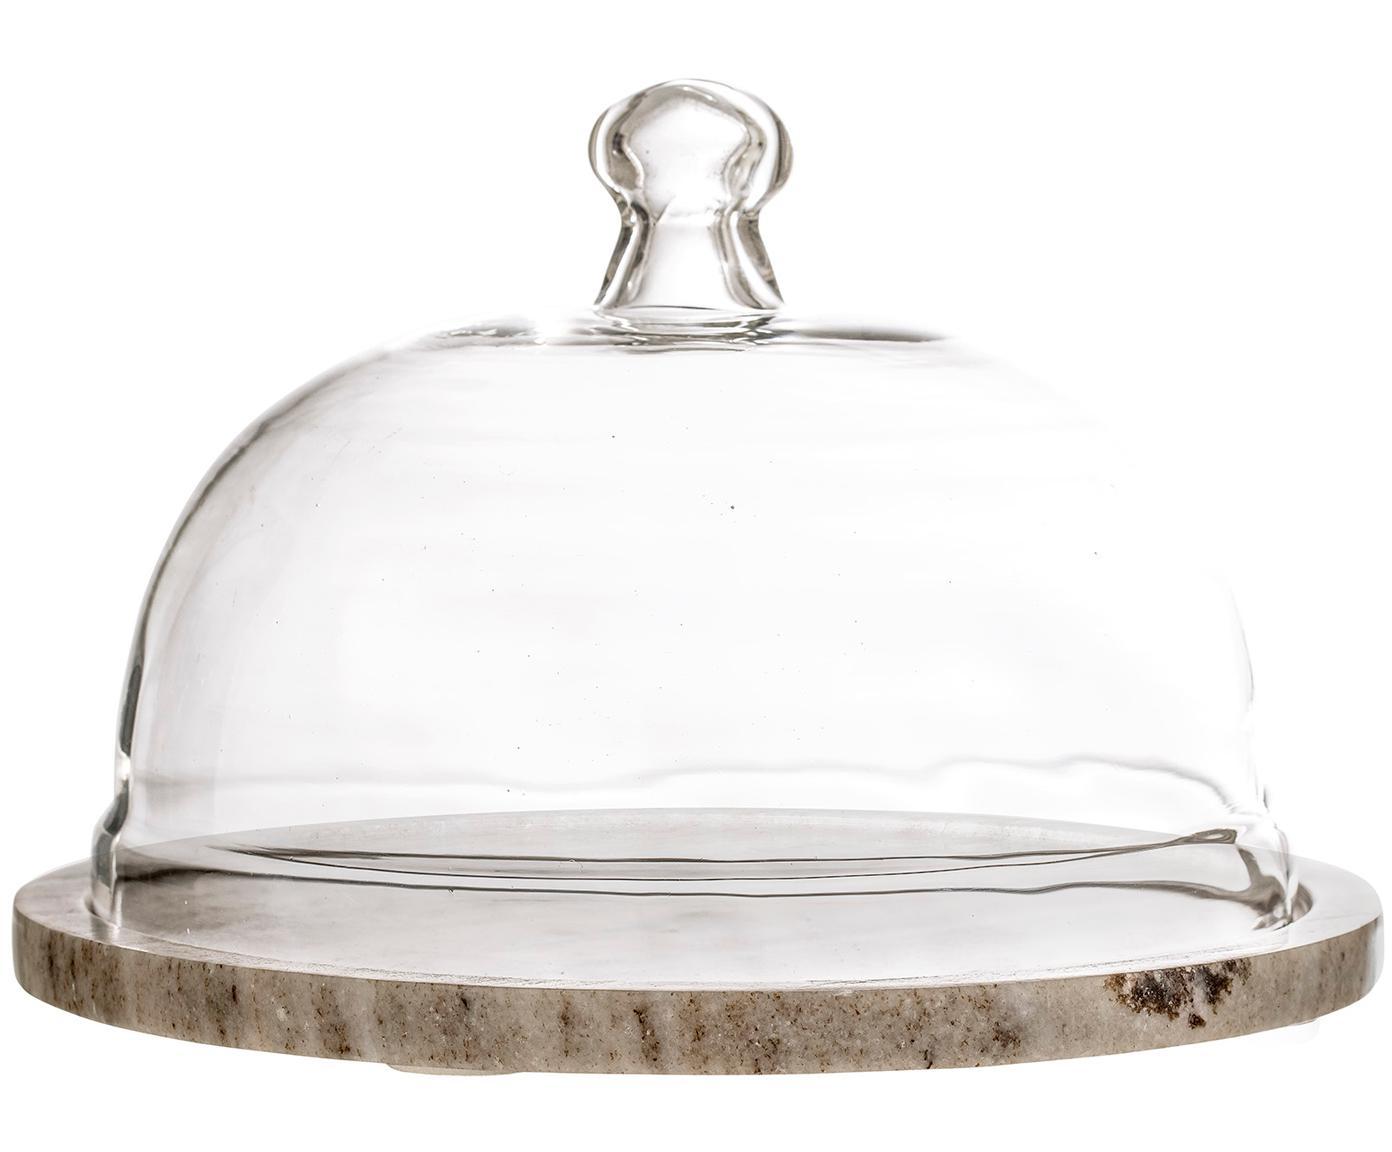 Campana para queso Cheese, Campana: vidrio, Beige, transparente, Ø 25 x Al 14 cm